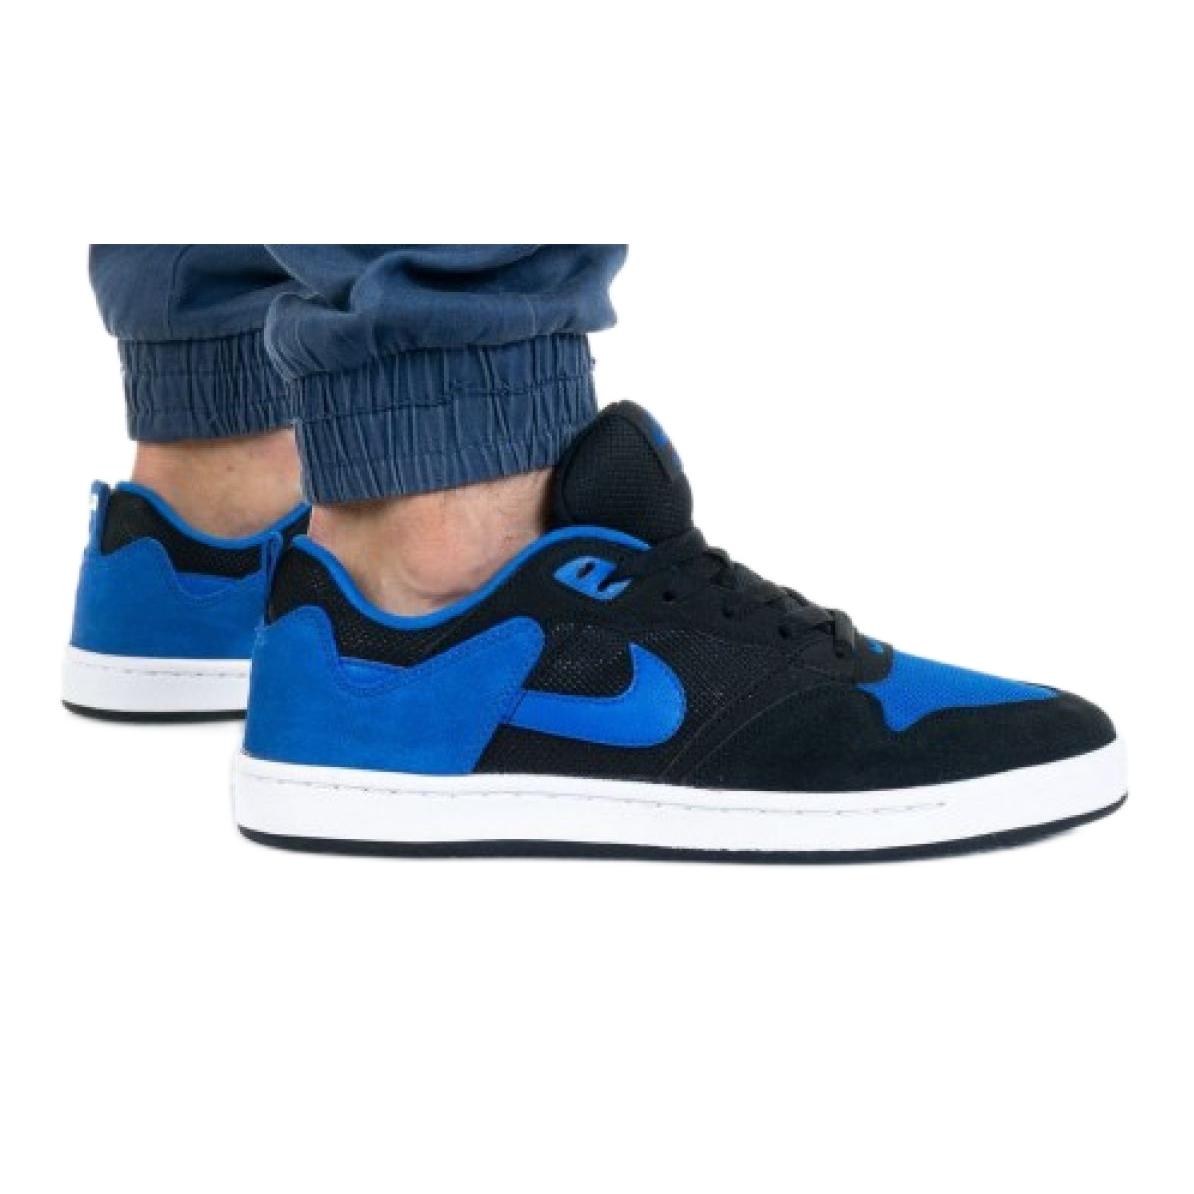 Nike Sb Alleyoop M CJ0882-004 shoes black blue